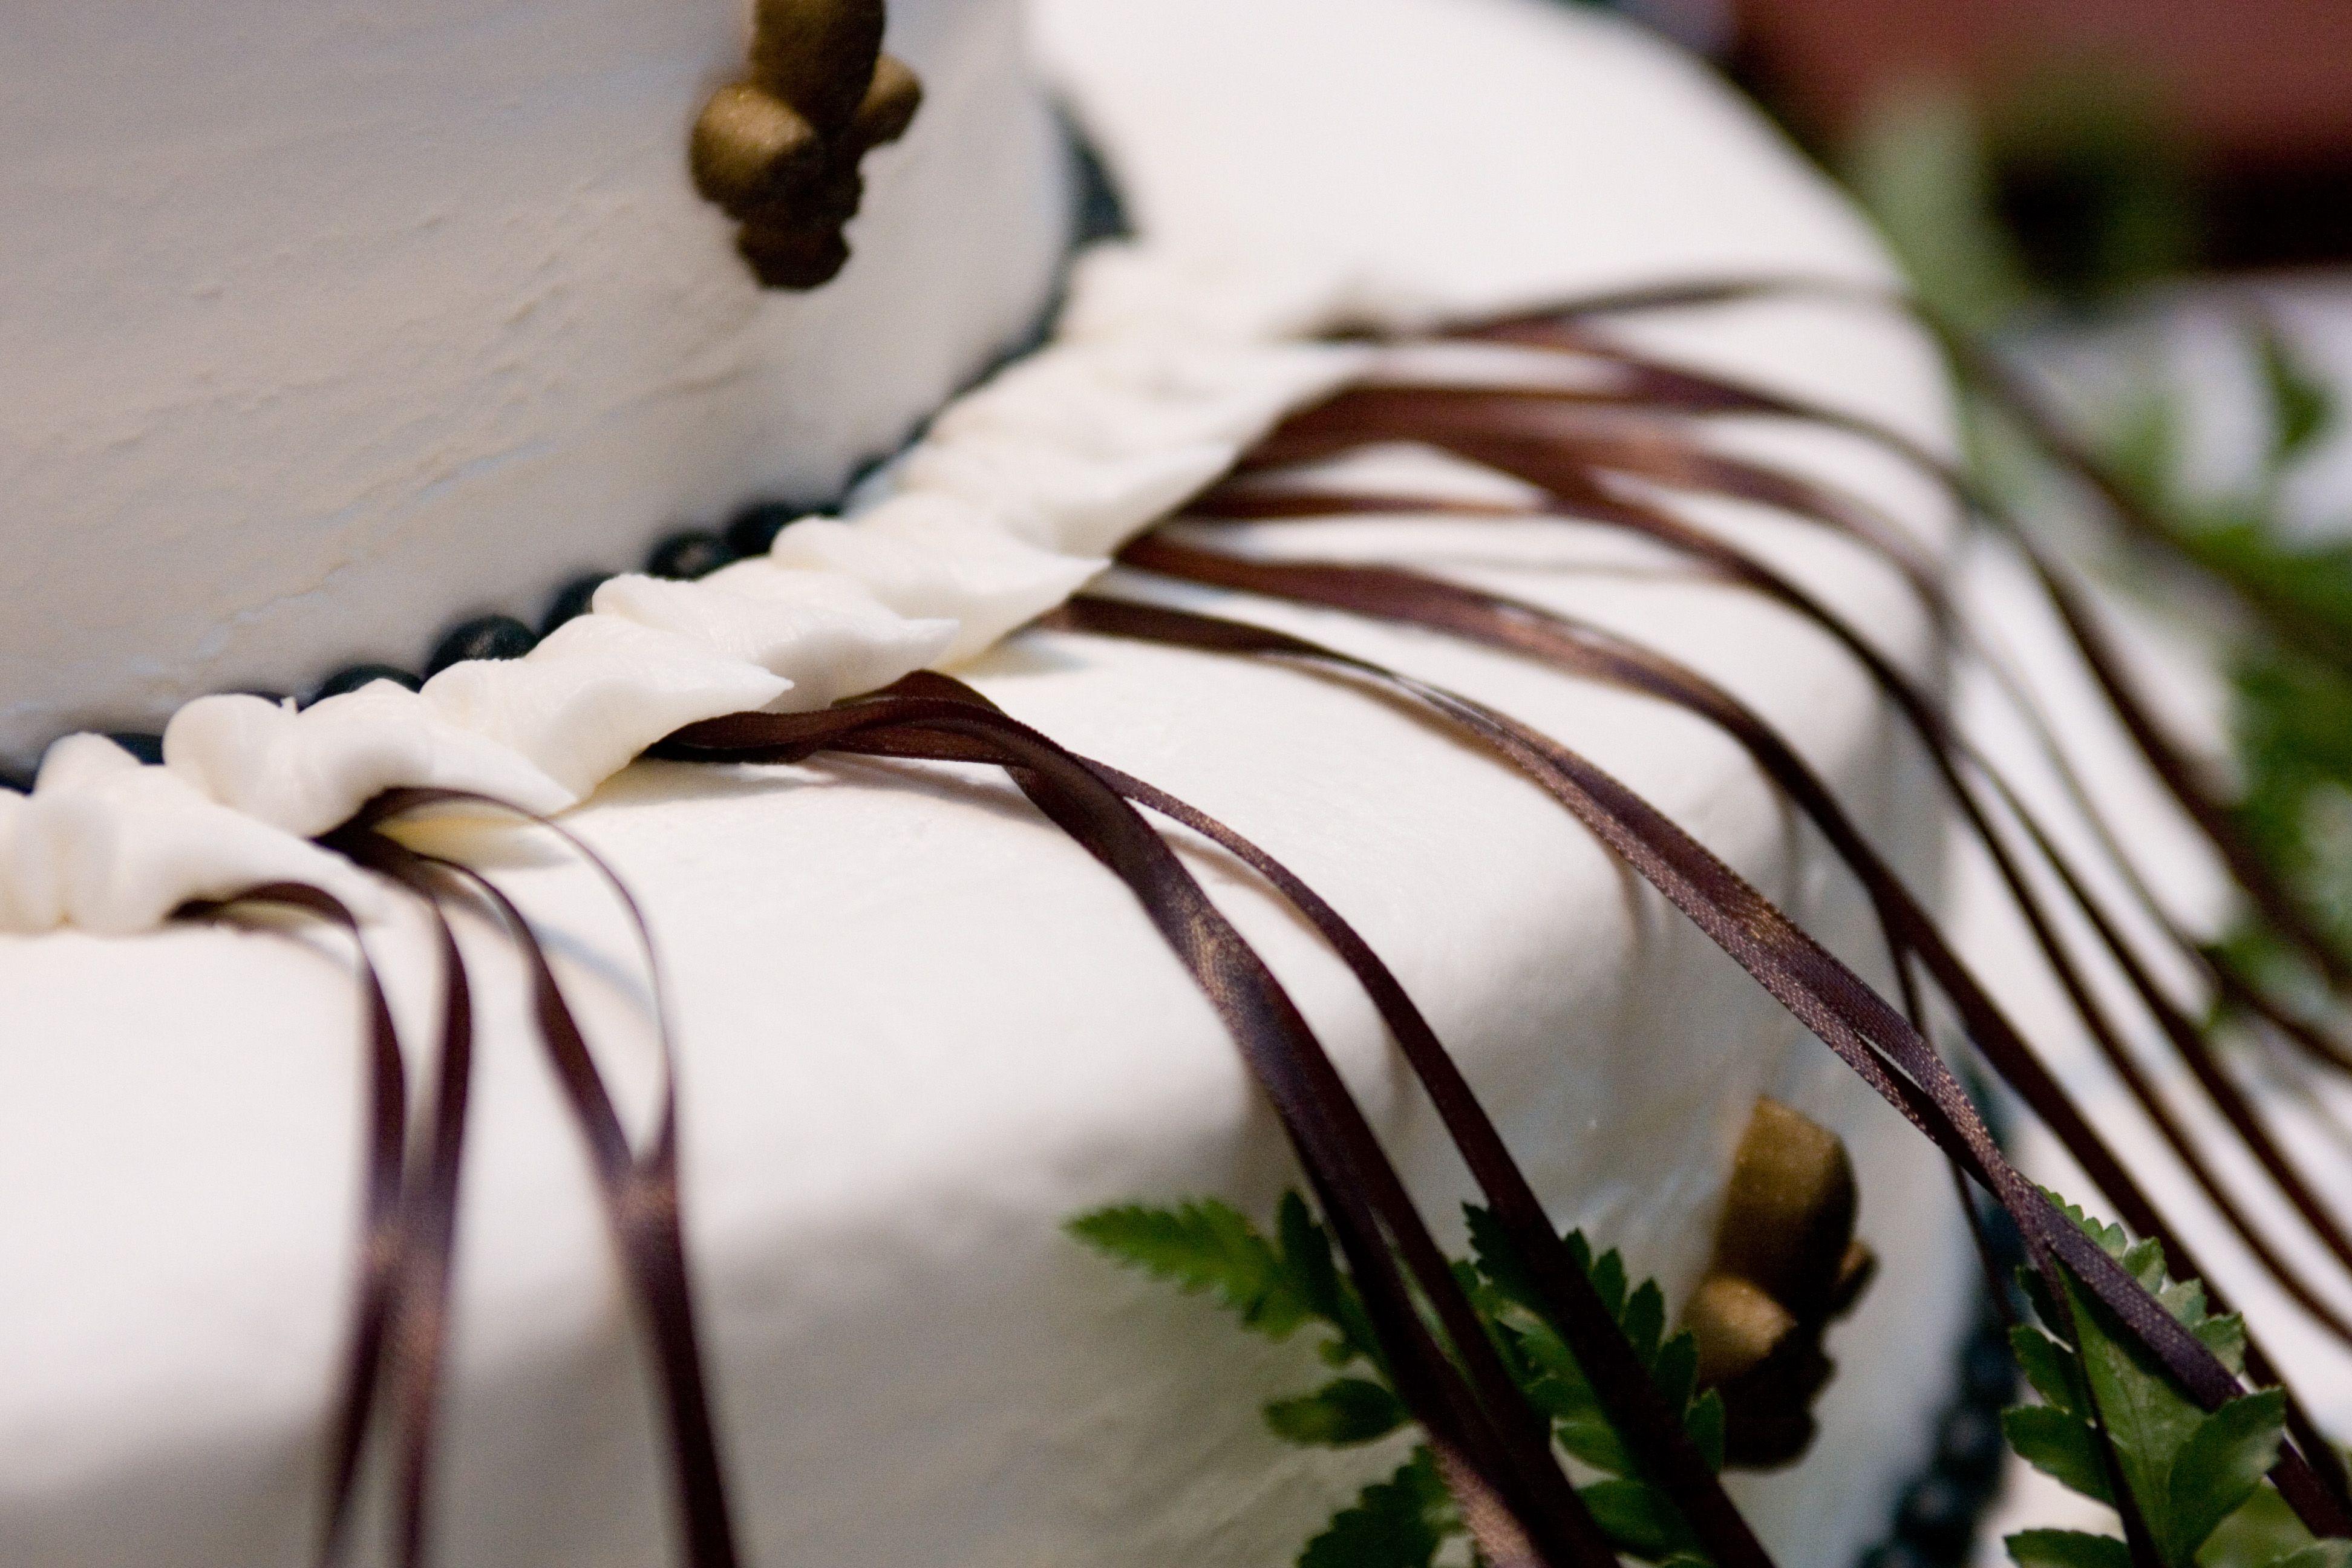 Wedding Cakes Around The World Peru Wedding Cake Pulls Wedding Cake Charms Southern Wedding Traditions